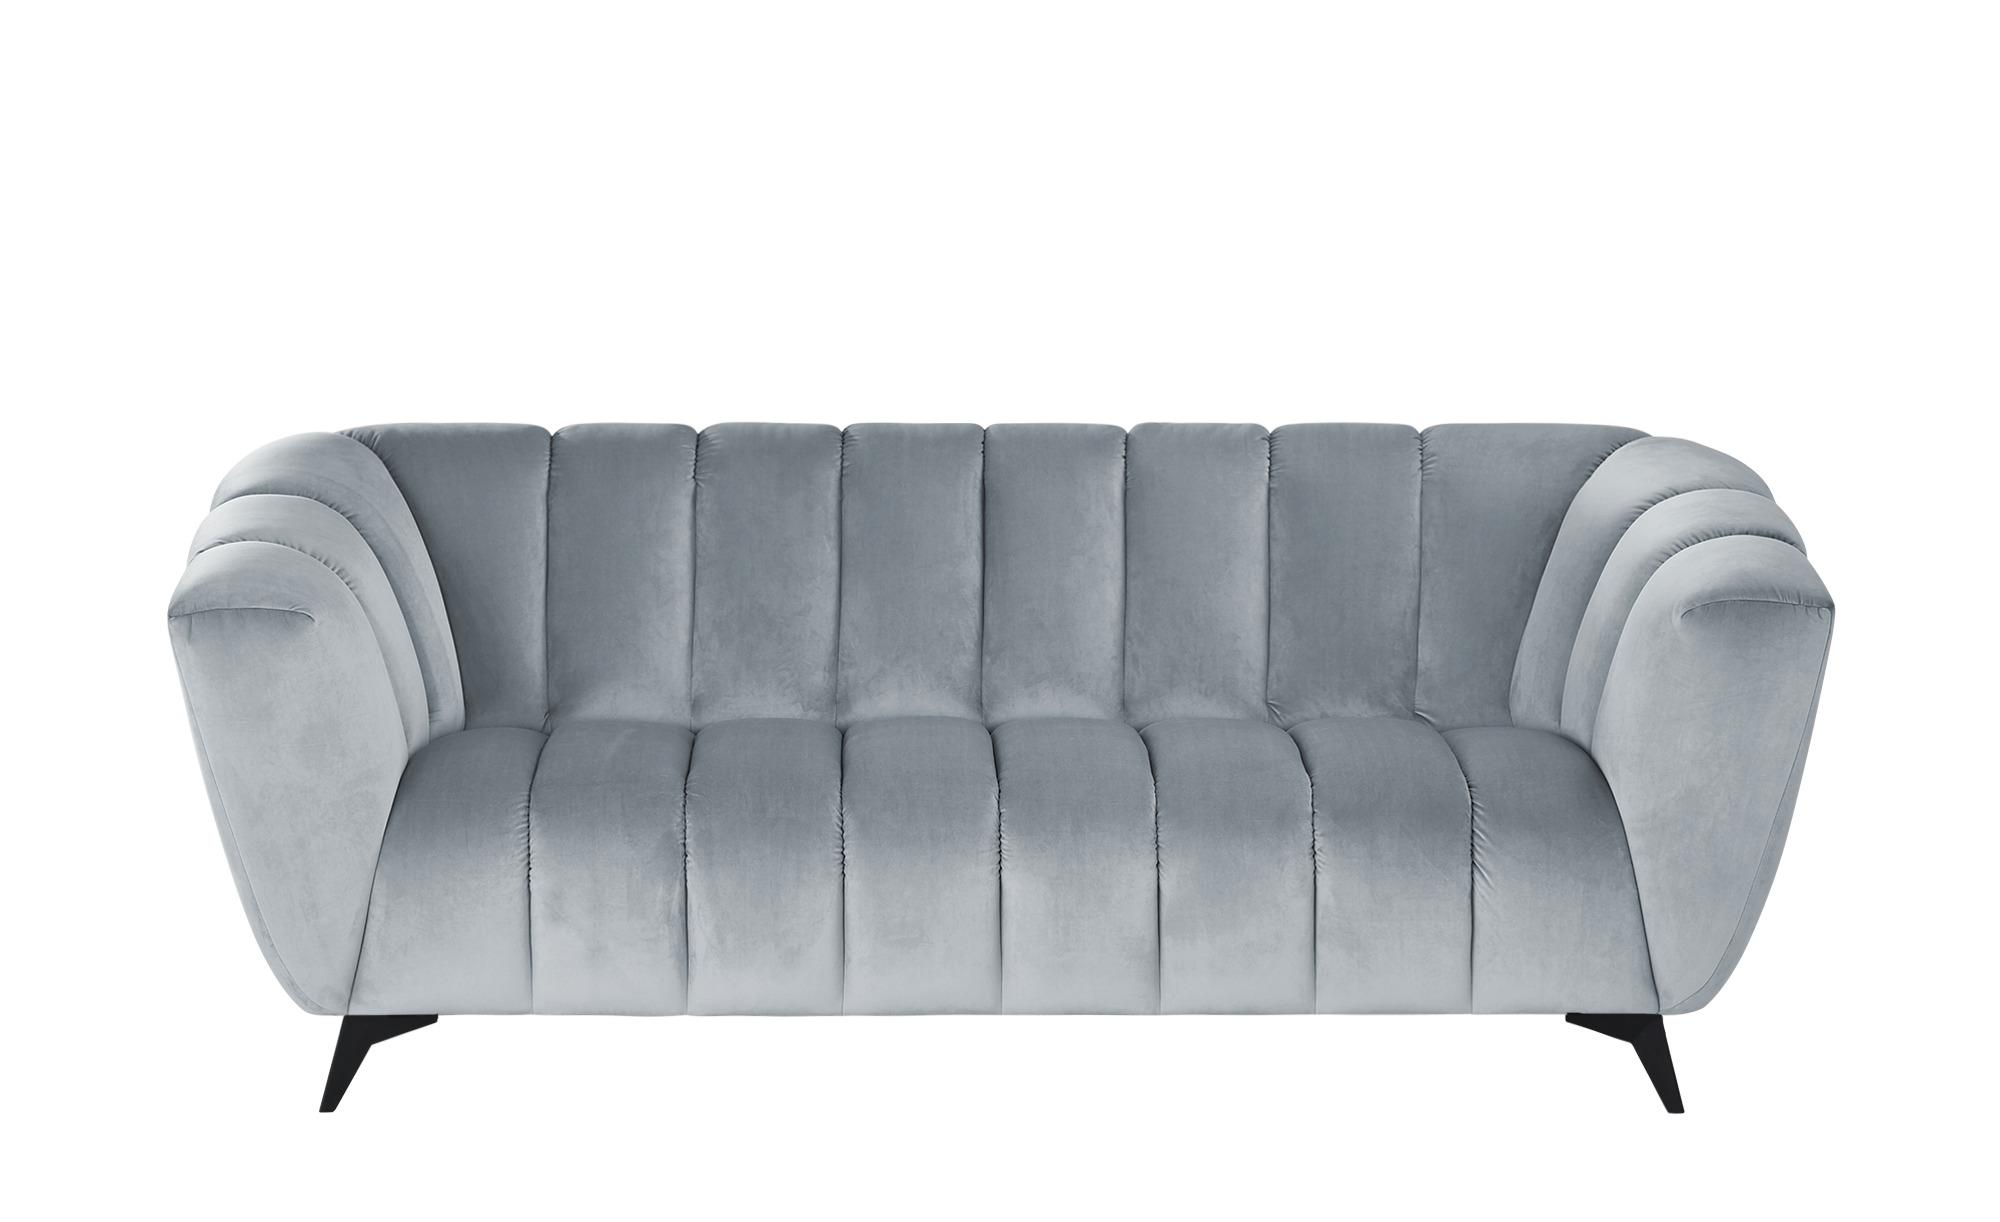 Sofa  Samantha ¦ blau ¦ Maße (cm): B: 220 H: 86 T: 100 Polstermöbel > Sofas > 3-Sitzer - Höffner